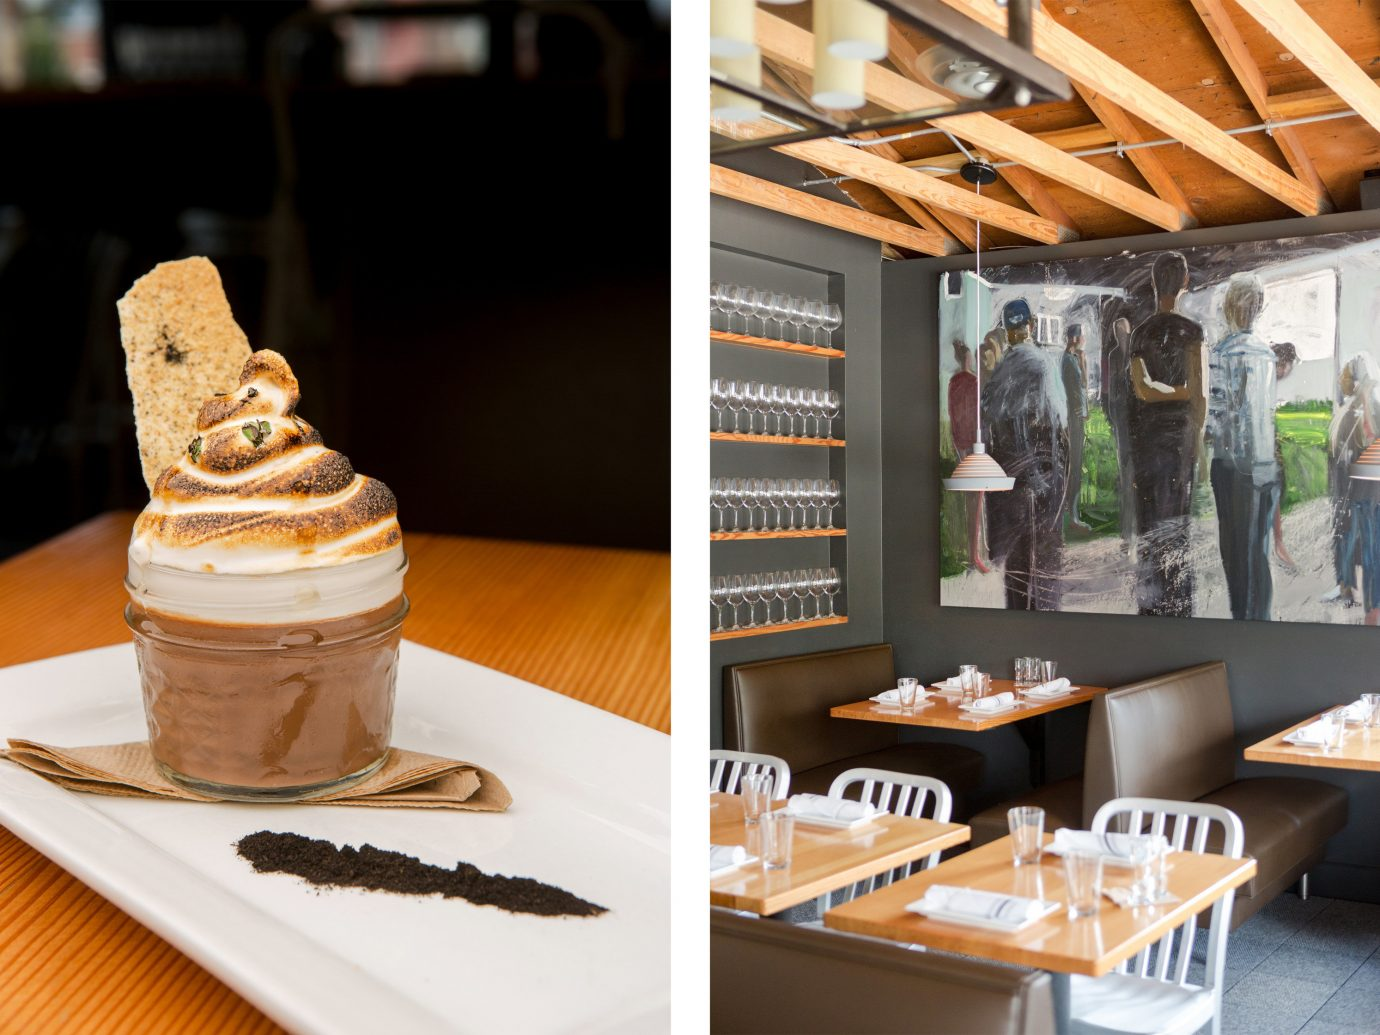 Food + Drink table indoor meal art bakery restaurant sense brunch food